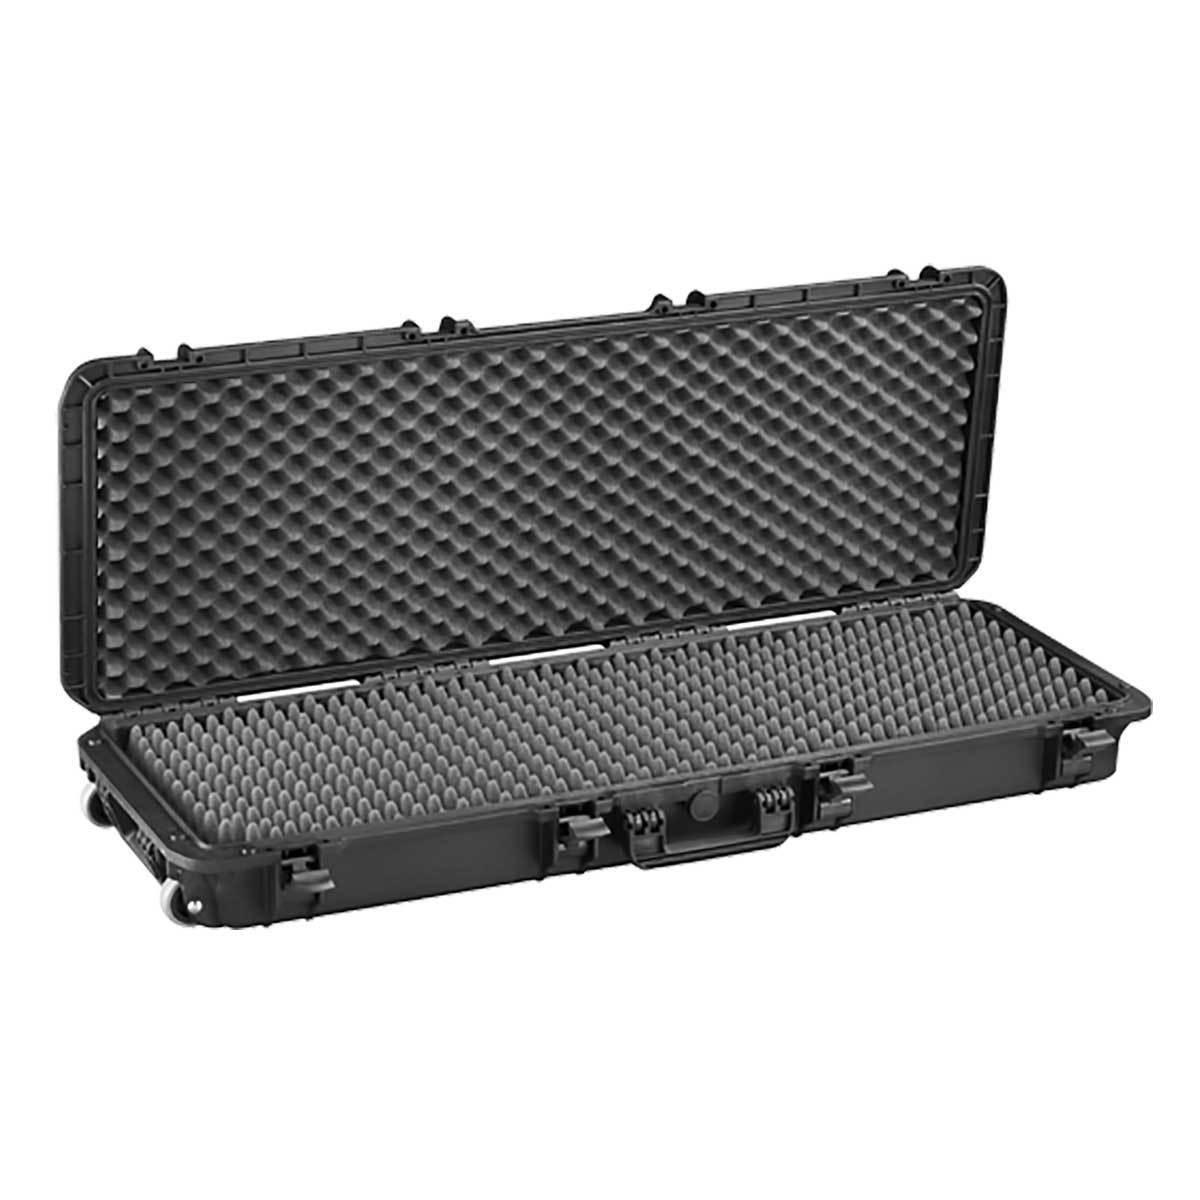 MAX 1100GPB Waterproof Rifle Gear Equipment Weapon Tool Camera Case Box Black